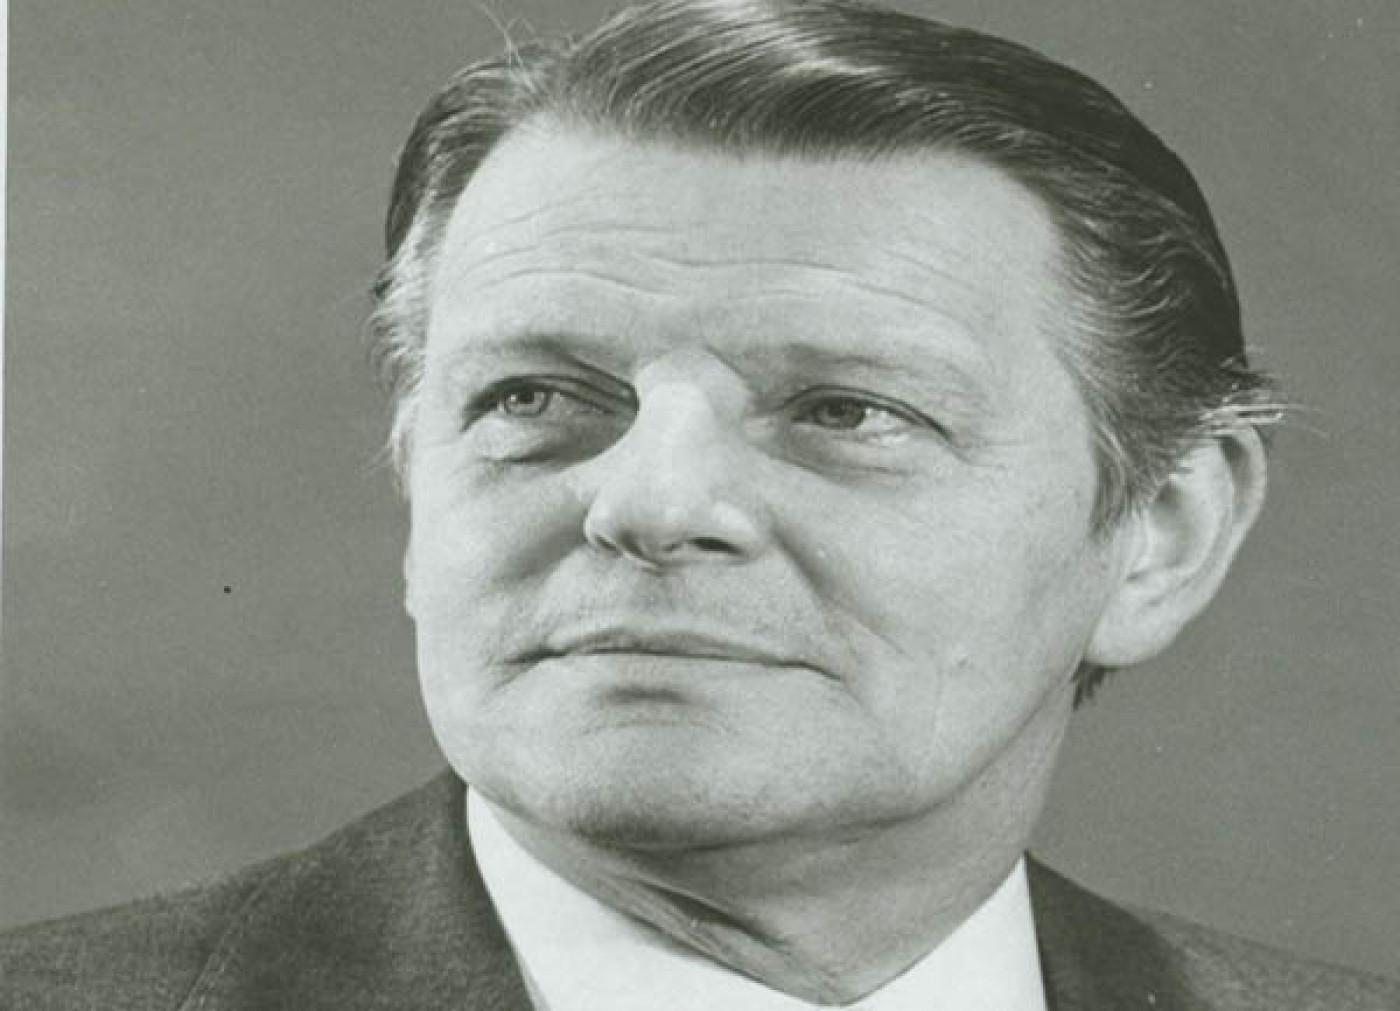 Johnny Auer